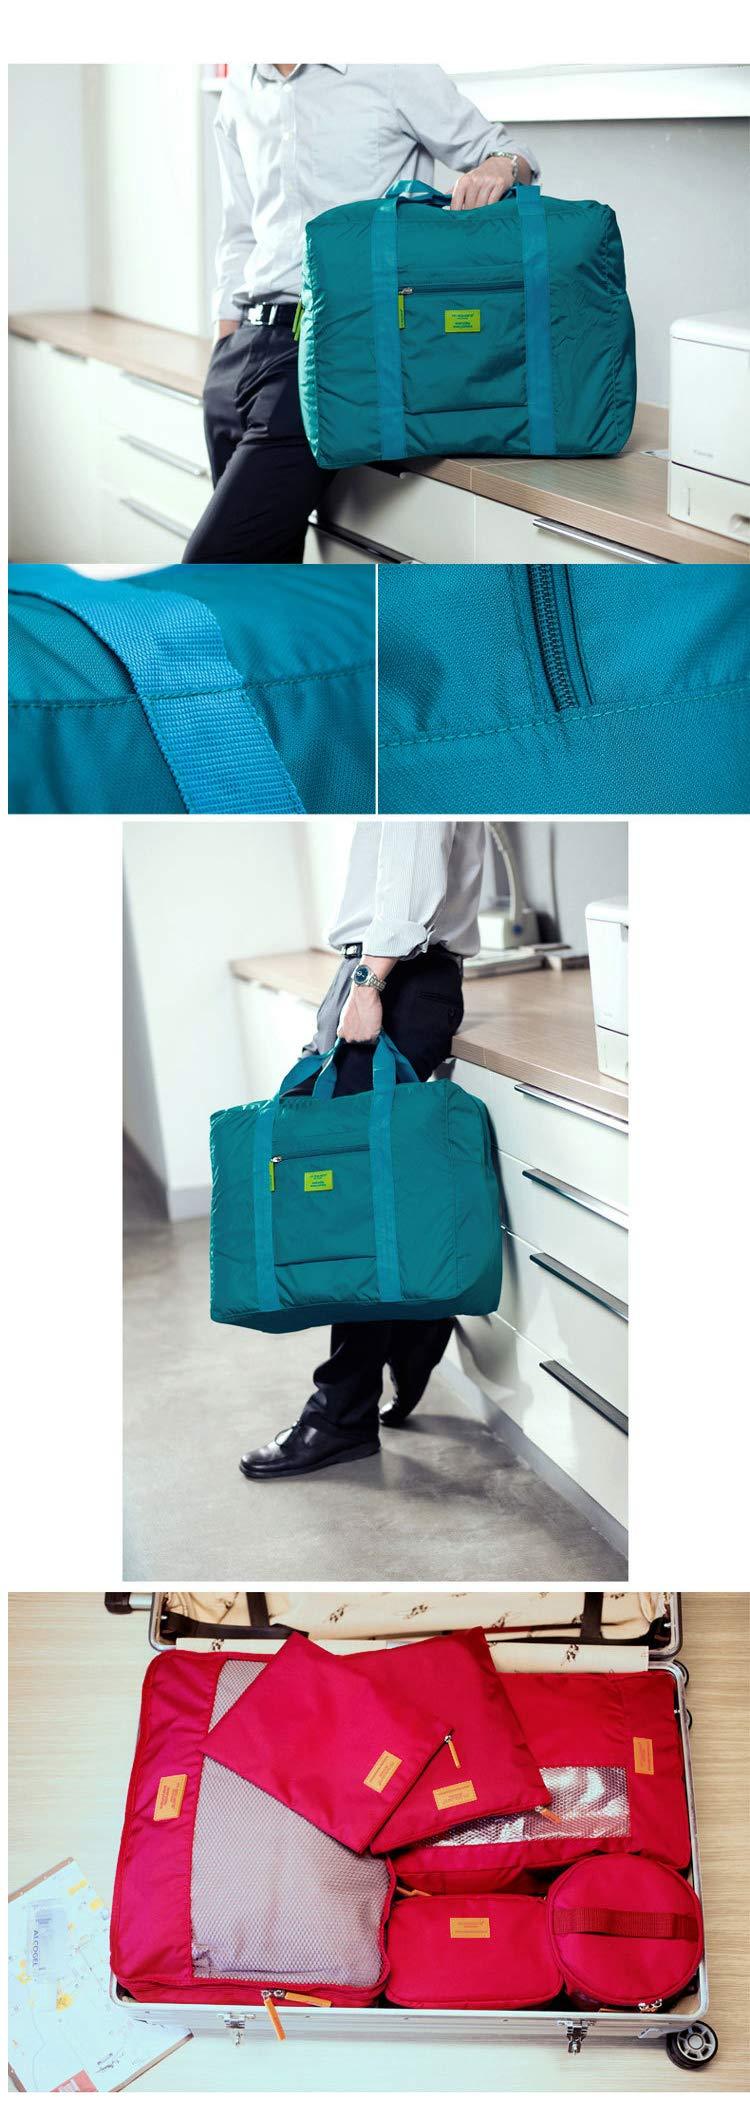 Foldable Travel Tote Duffel Bag Lightweight Travel Bag Weekend Waterproof Large Capacity Storage Luggage Organizer (Navy Blue) by Guyay (Image #6)